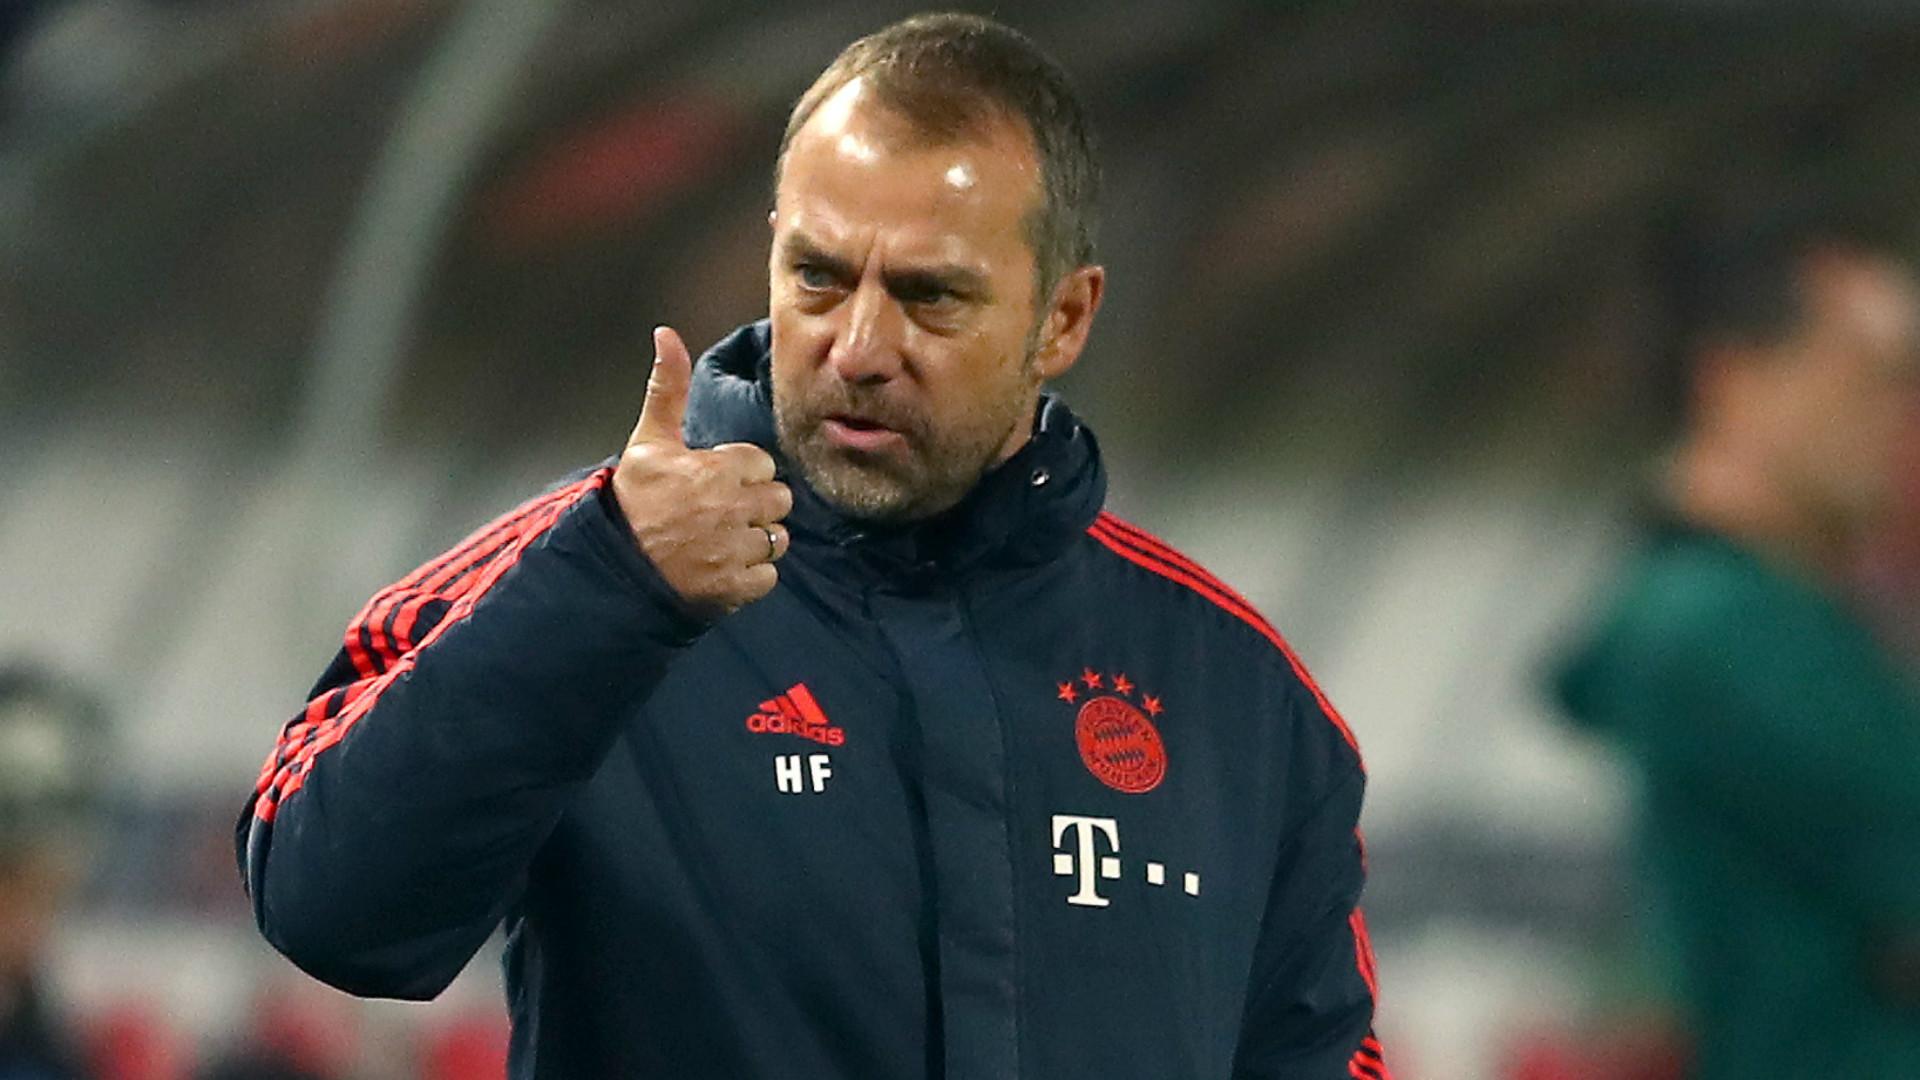 Respect for Flick sparked Bayern turnaround & Dortmund vs Schalke is Bundesliga's best game - Elber